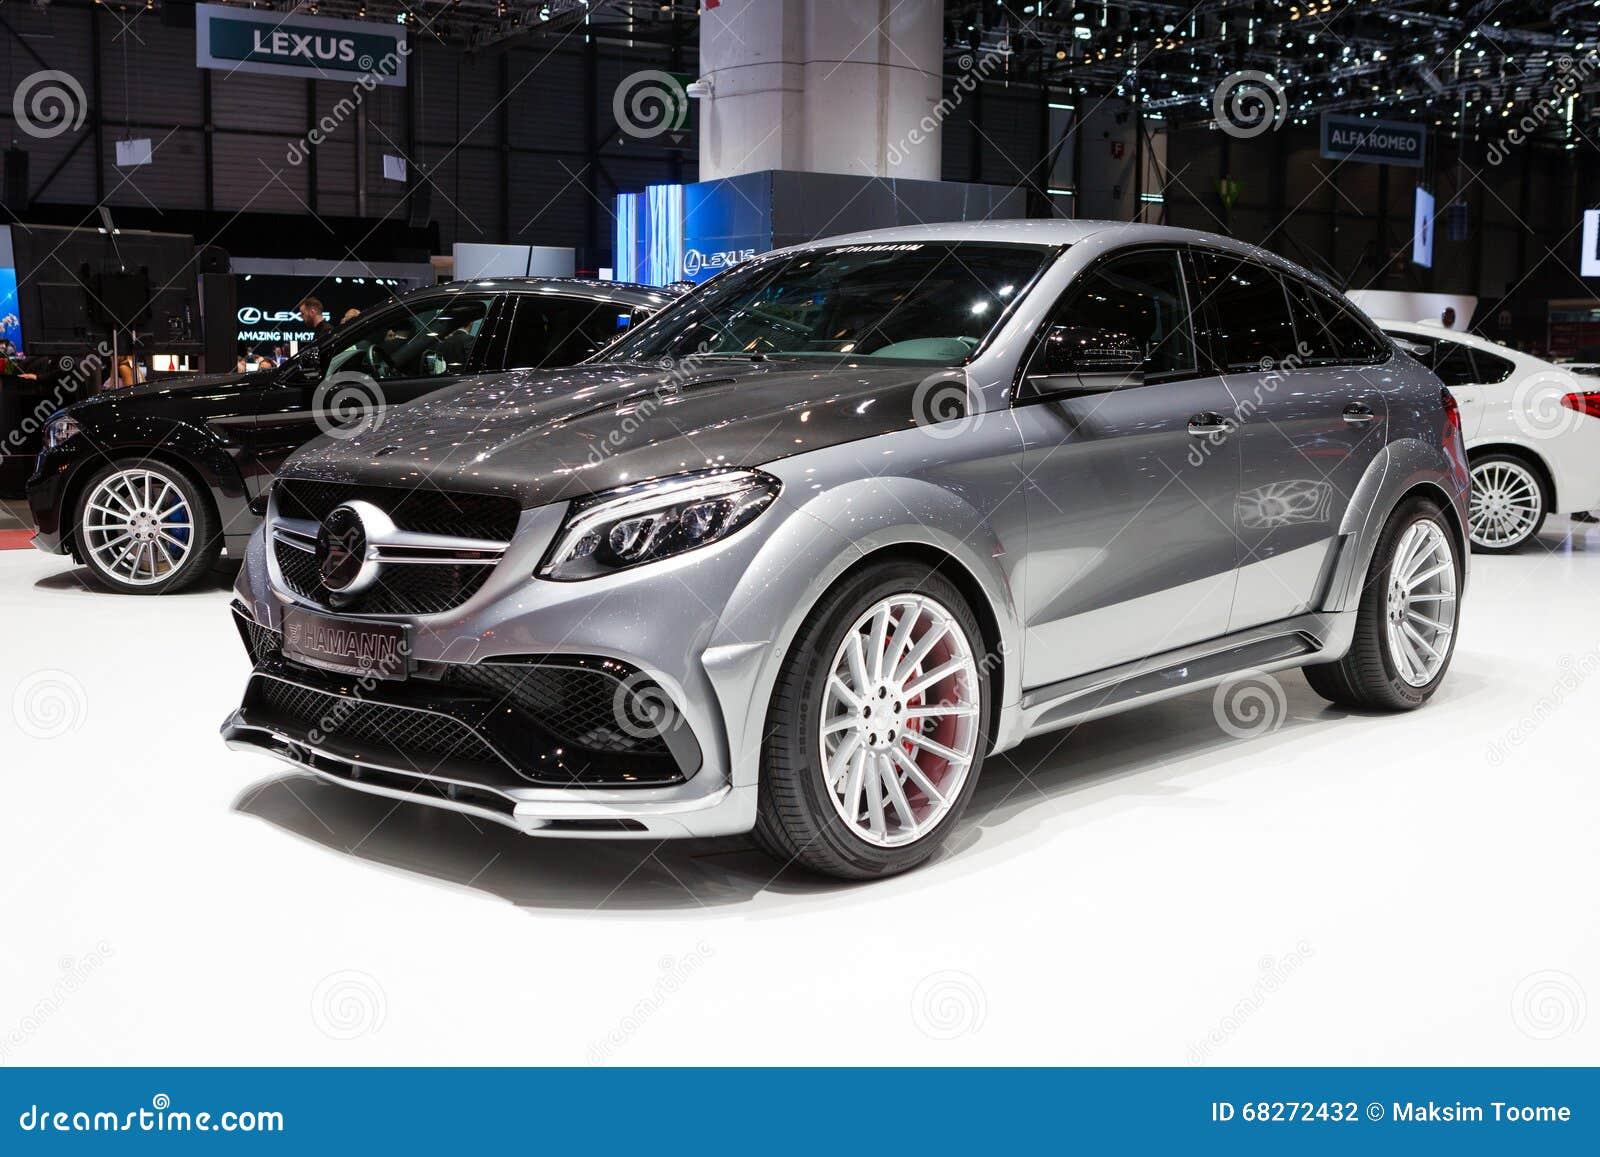 Hamann mercedes benz gle coupe editorial photography for Mercedes benz gle coupe for sale